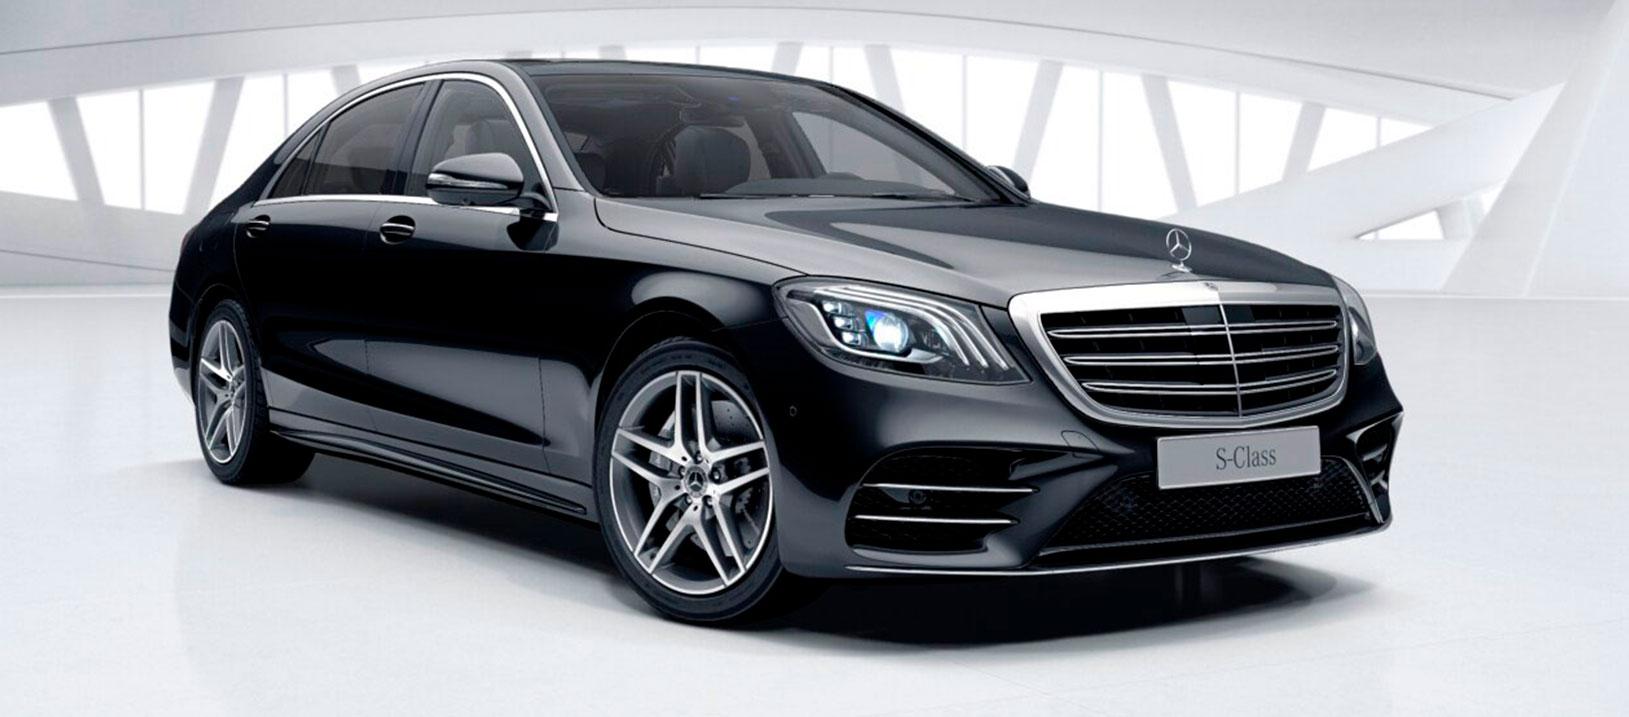 Mercedes-Benz S 400 d 4MATIC long 52600214